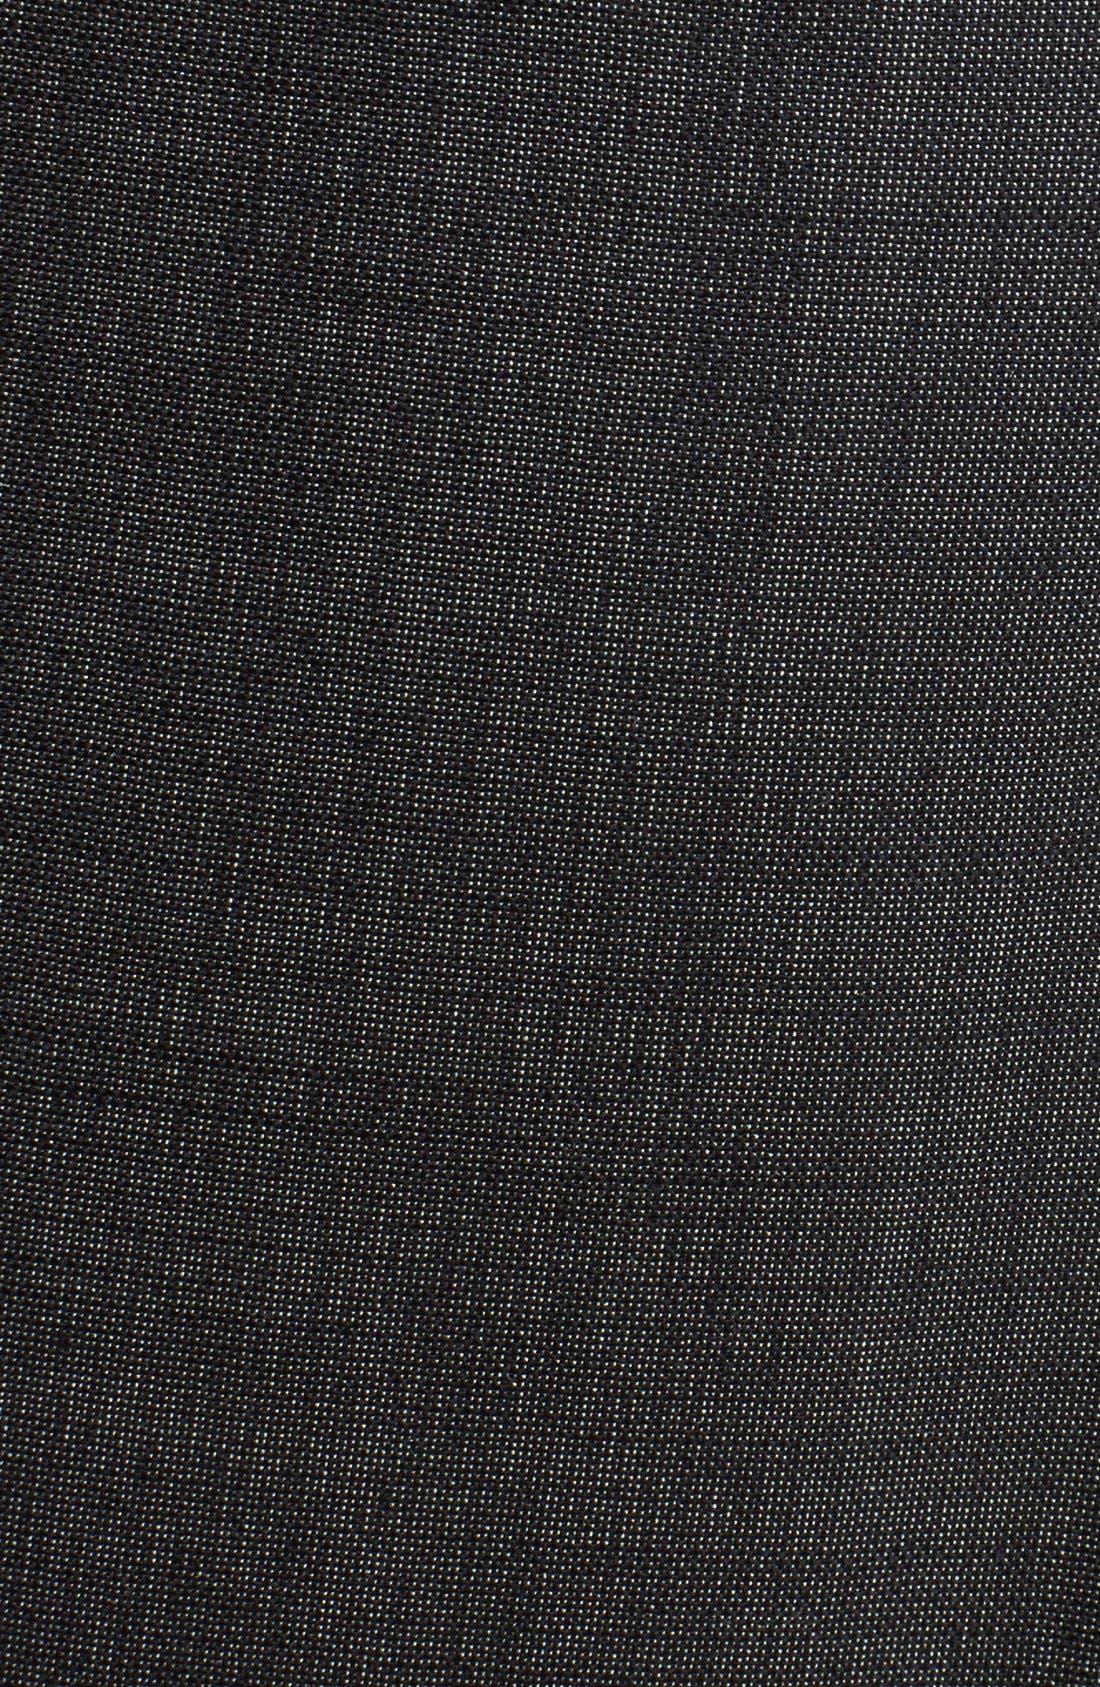 Alternate Image 3  - Max Mara 'Allesia' Wool Blend Pants